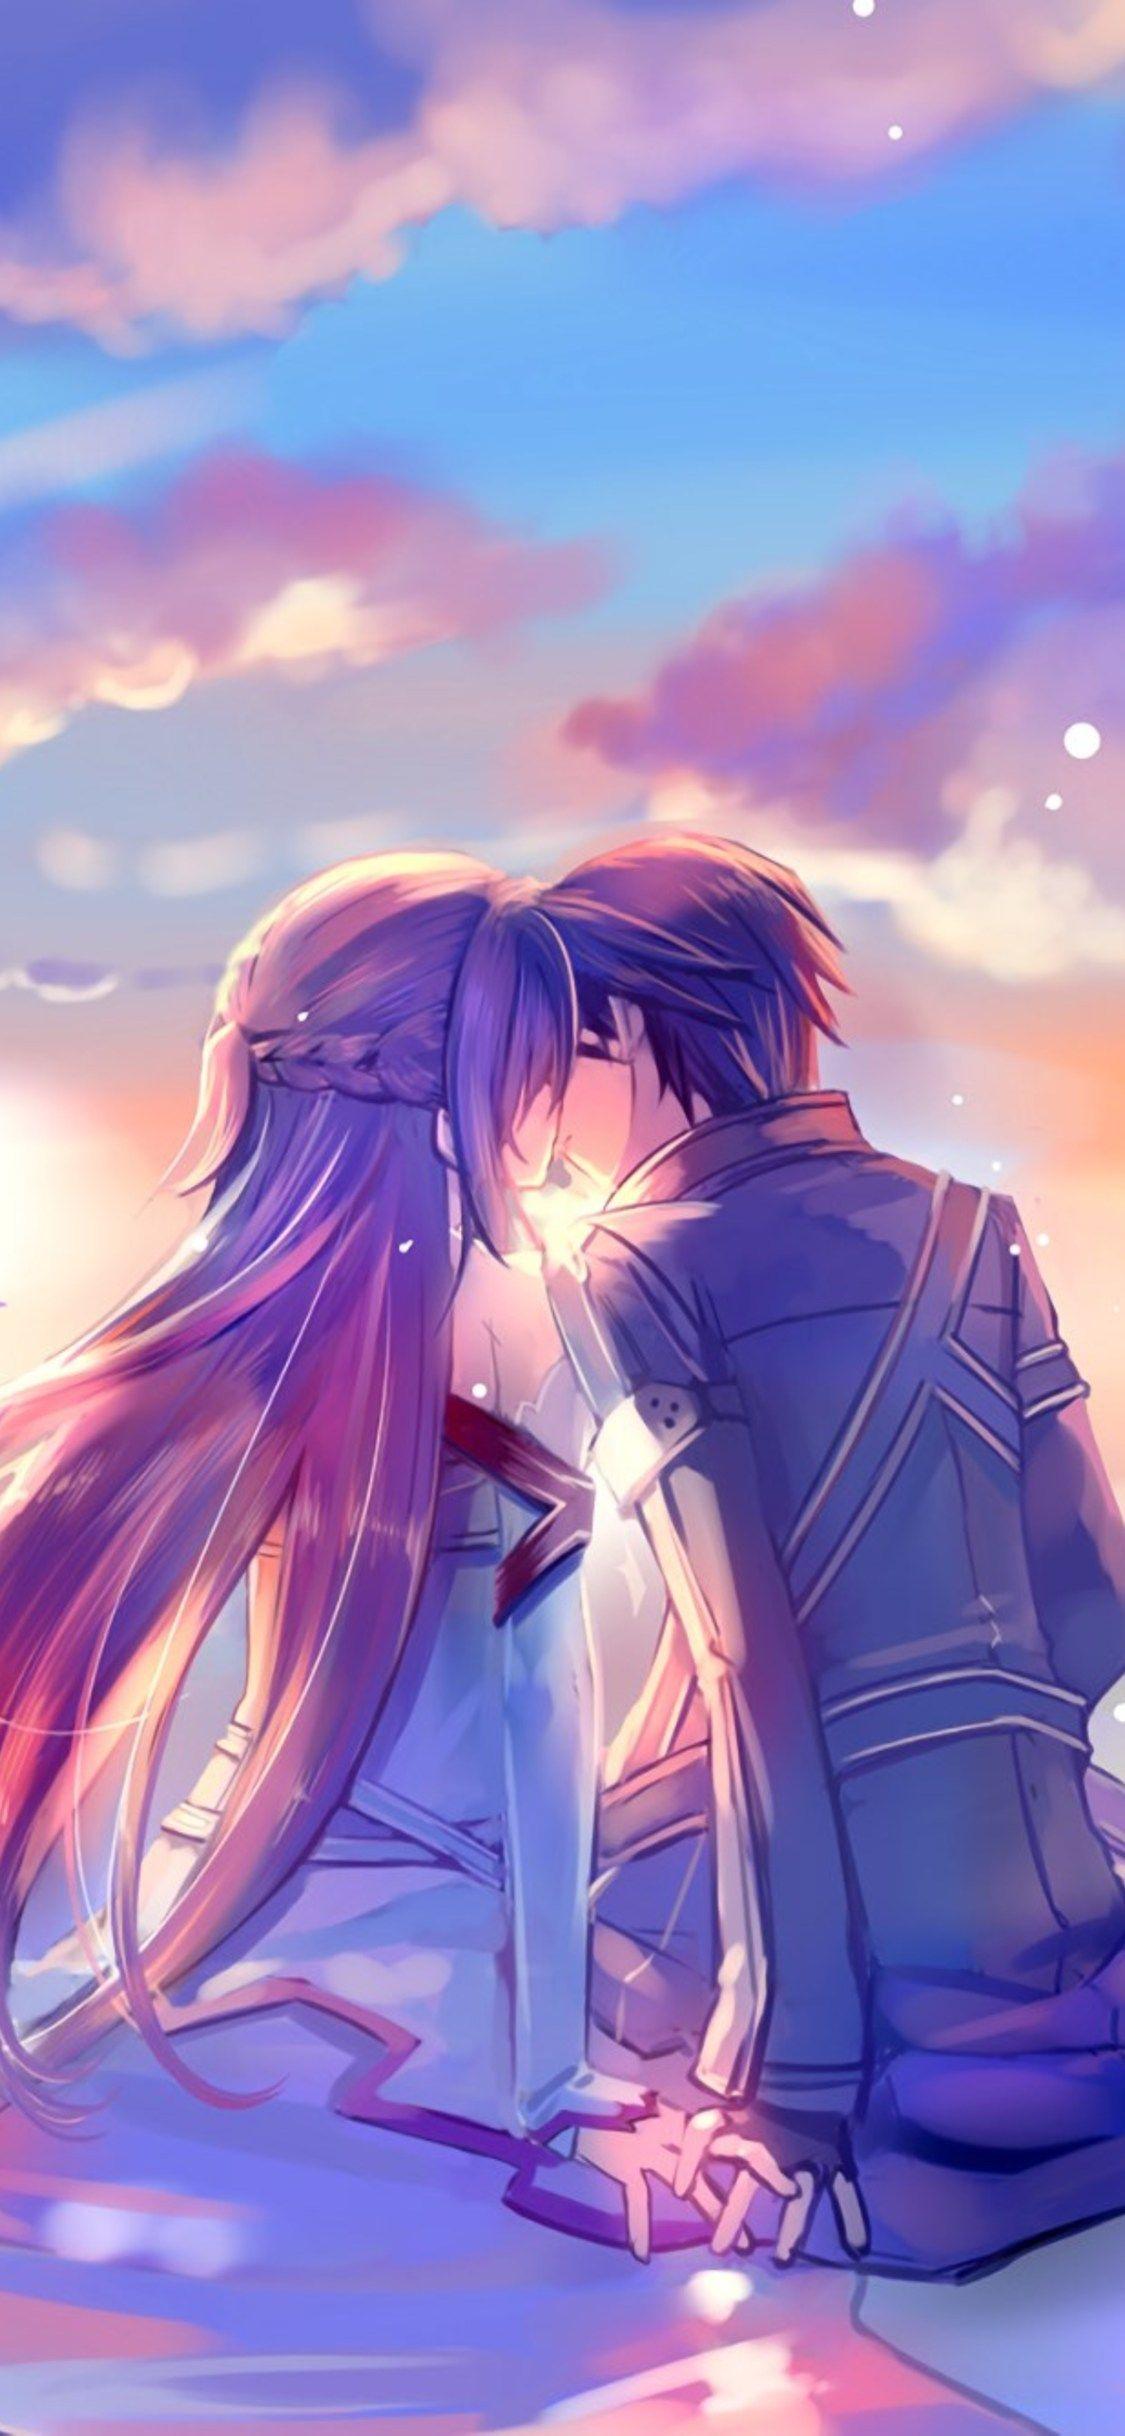 Best Anime Backgrounds Wallpaper Engine : anime, backgrounds, wallpaper, engine, Anime, Wallpapers, WallpaperDog